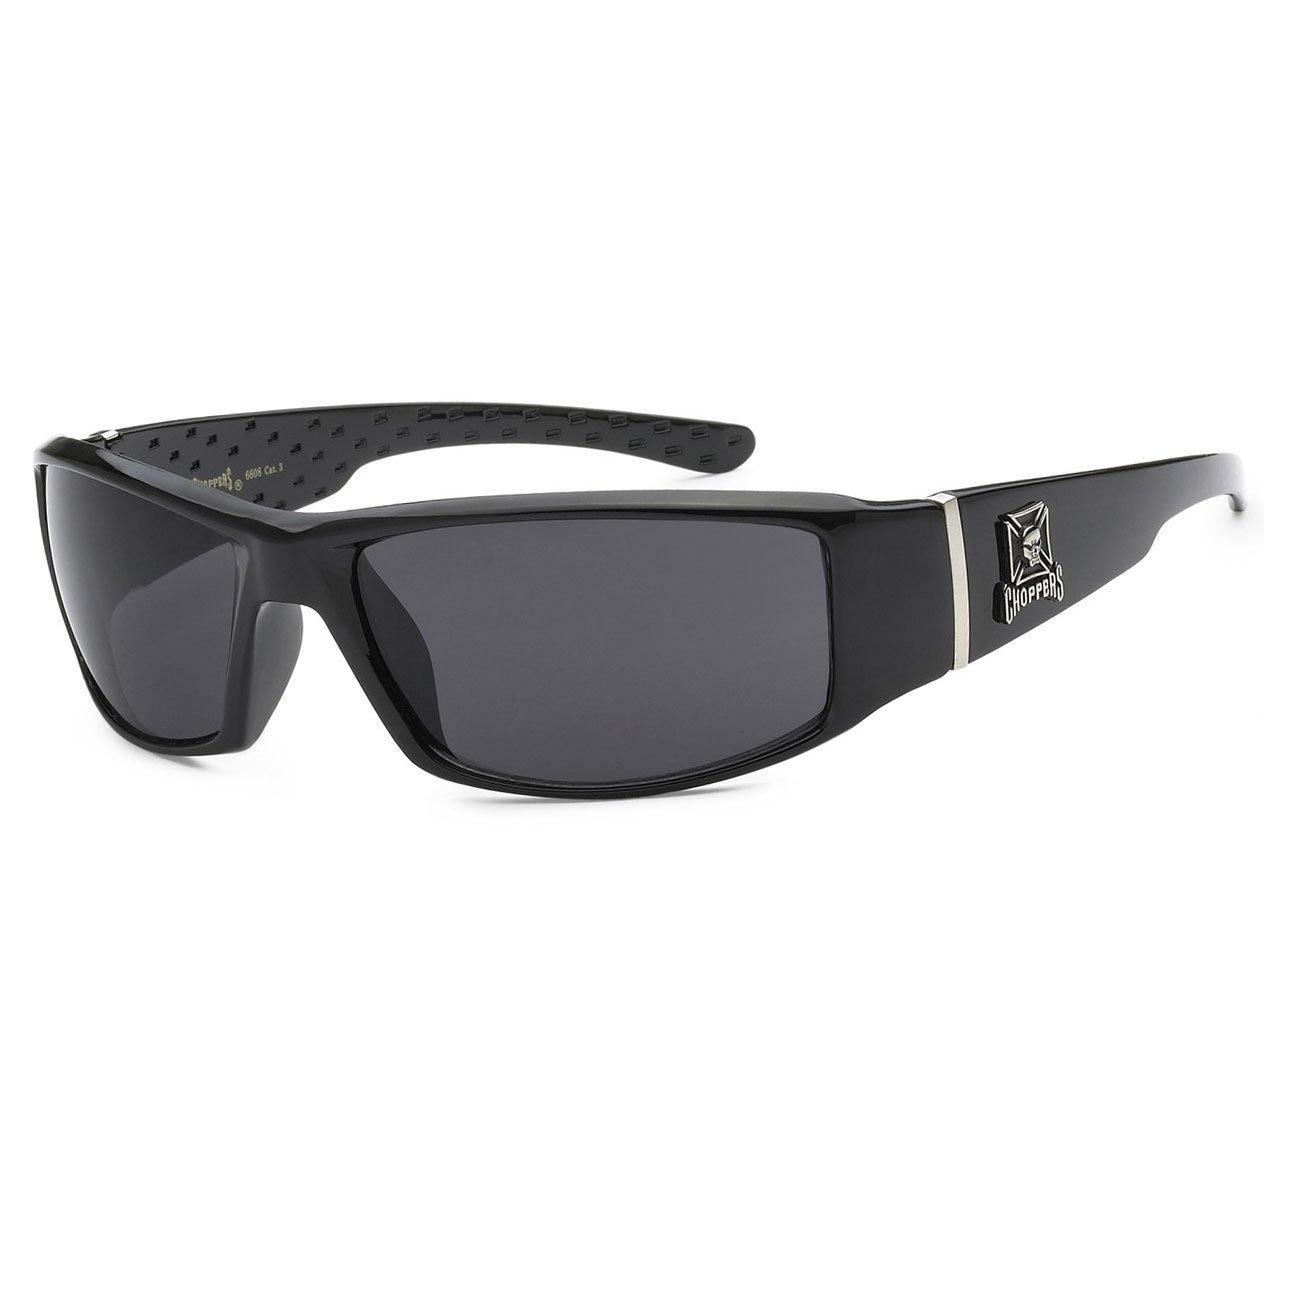 Mens Choppers Sunglasses Biker Motorcycle Logos Cross Skull All Black